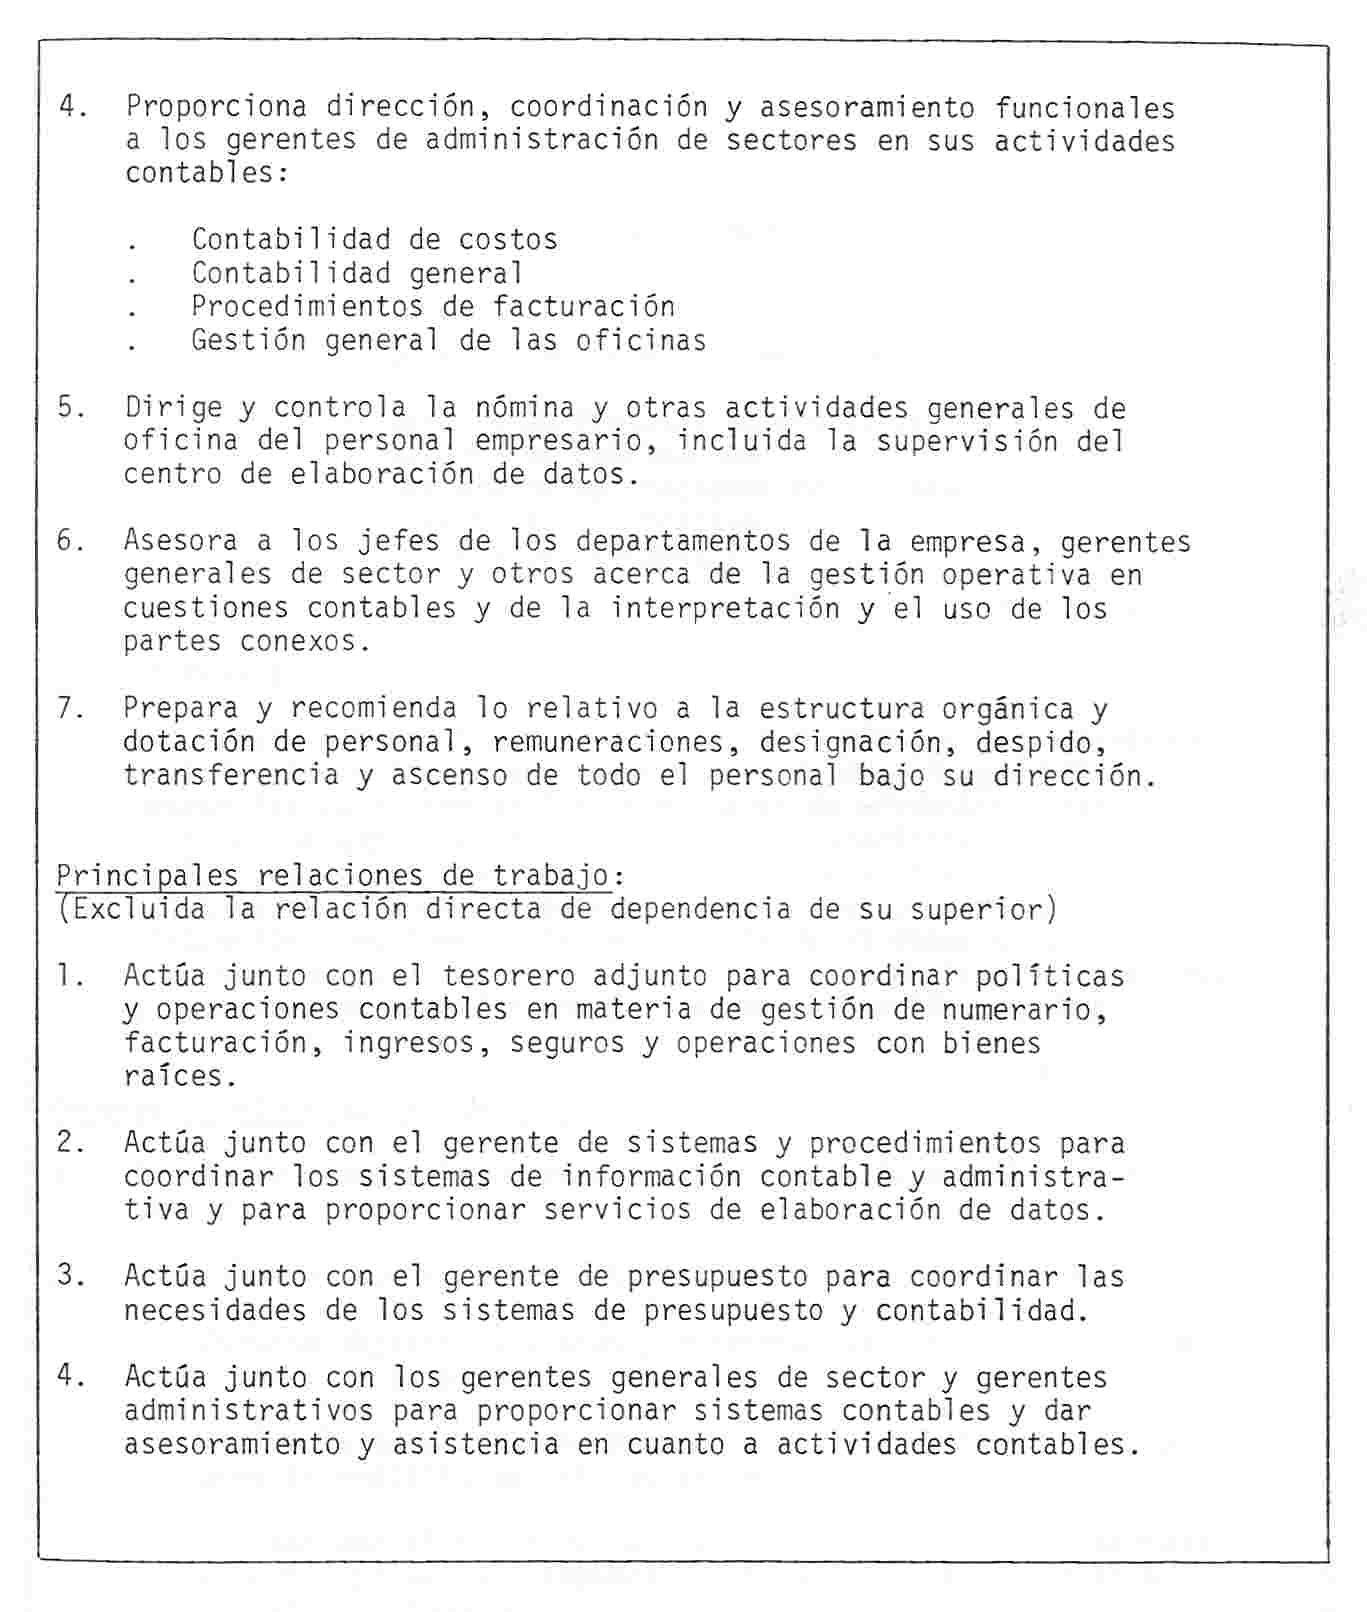 Astronomy argumentative essay topics image 2